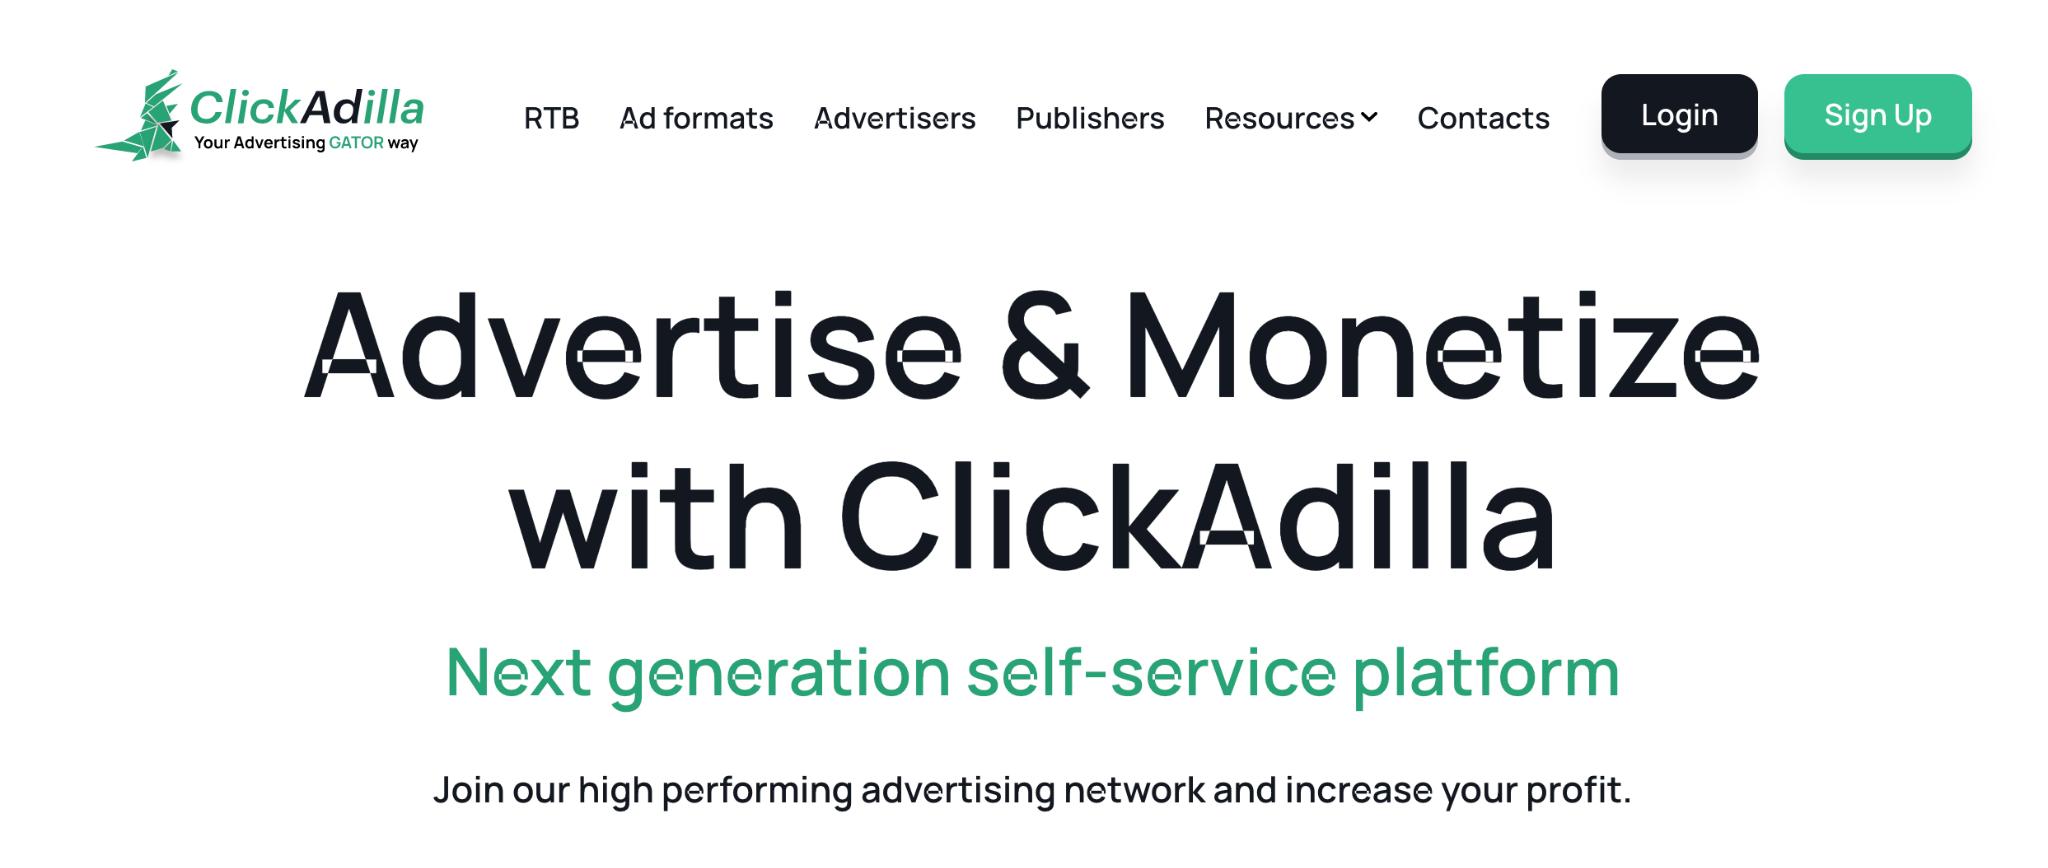 ClickAdilla Homepage